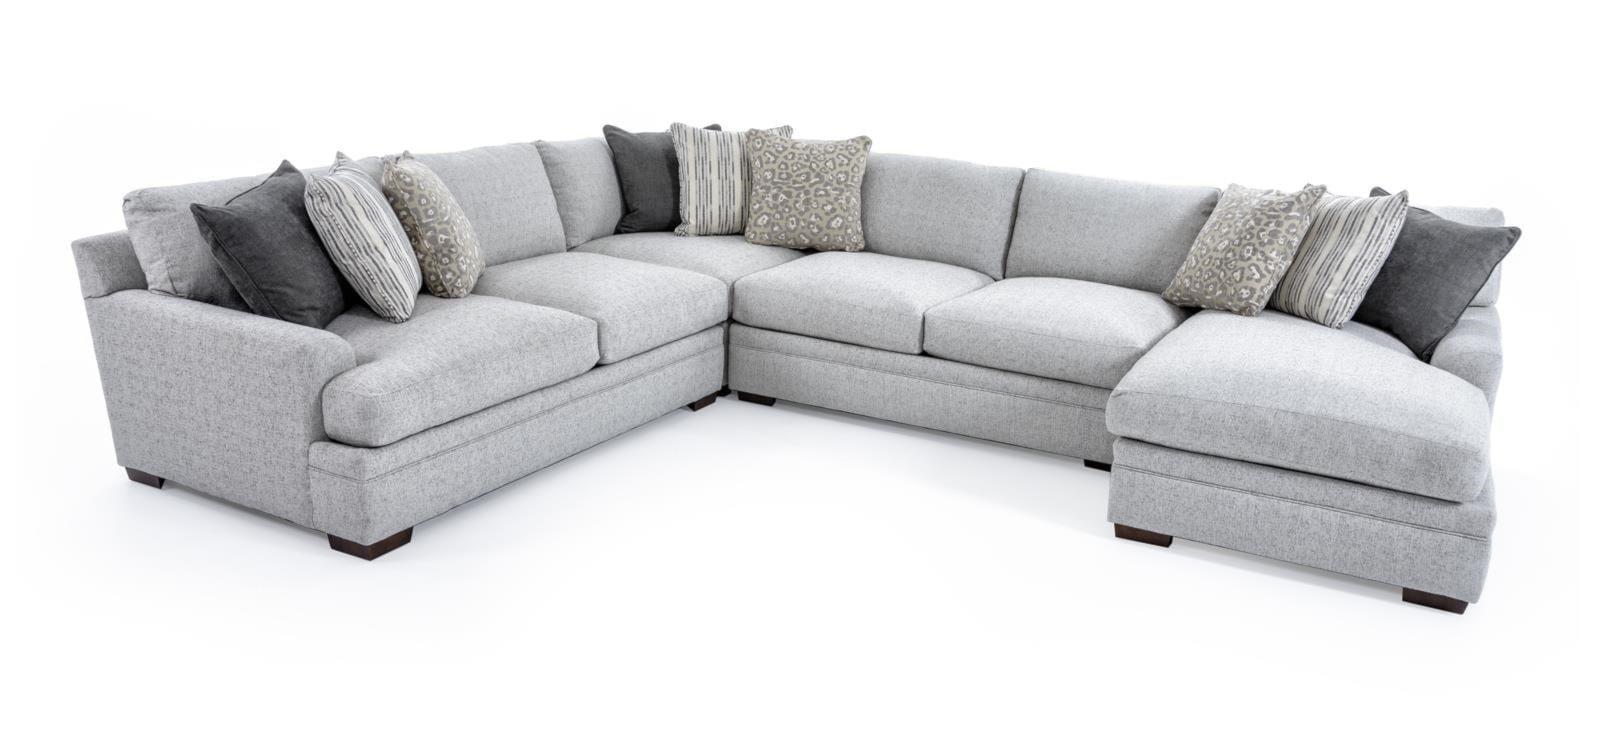 4 Pc Sectional Sofa Artemis Ii 4 Pc Microfiber Sectional